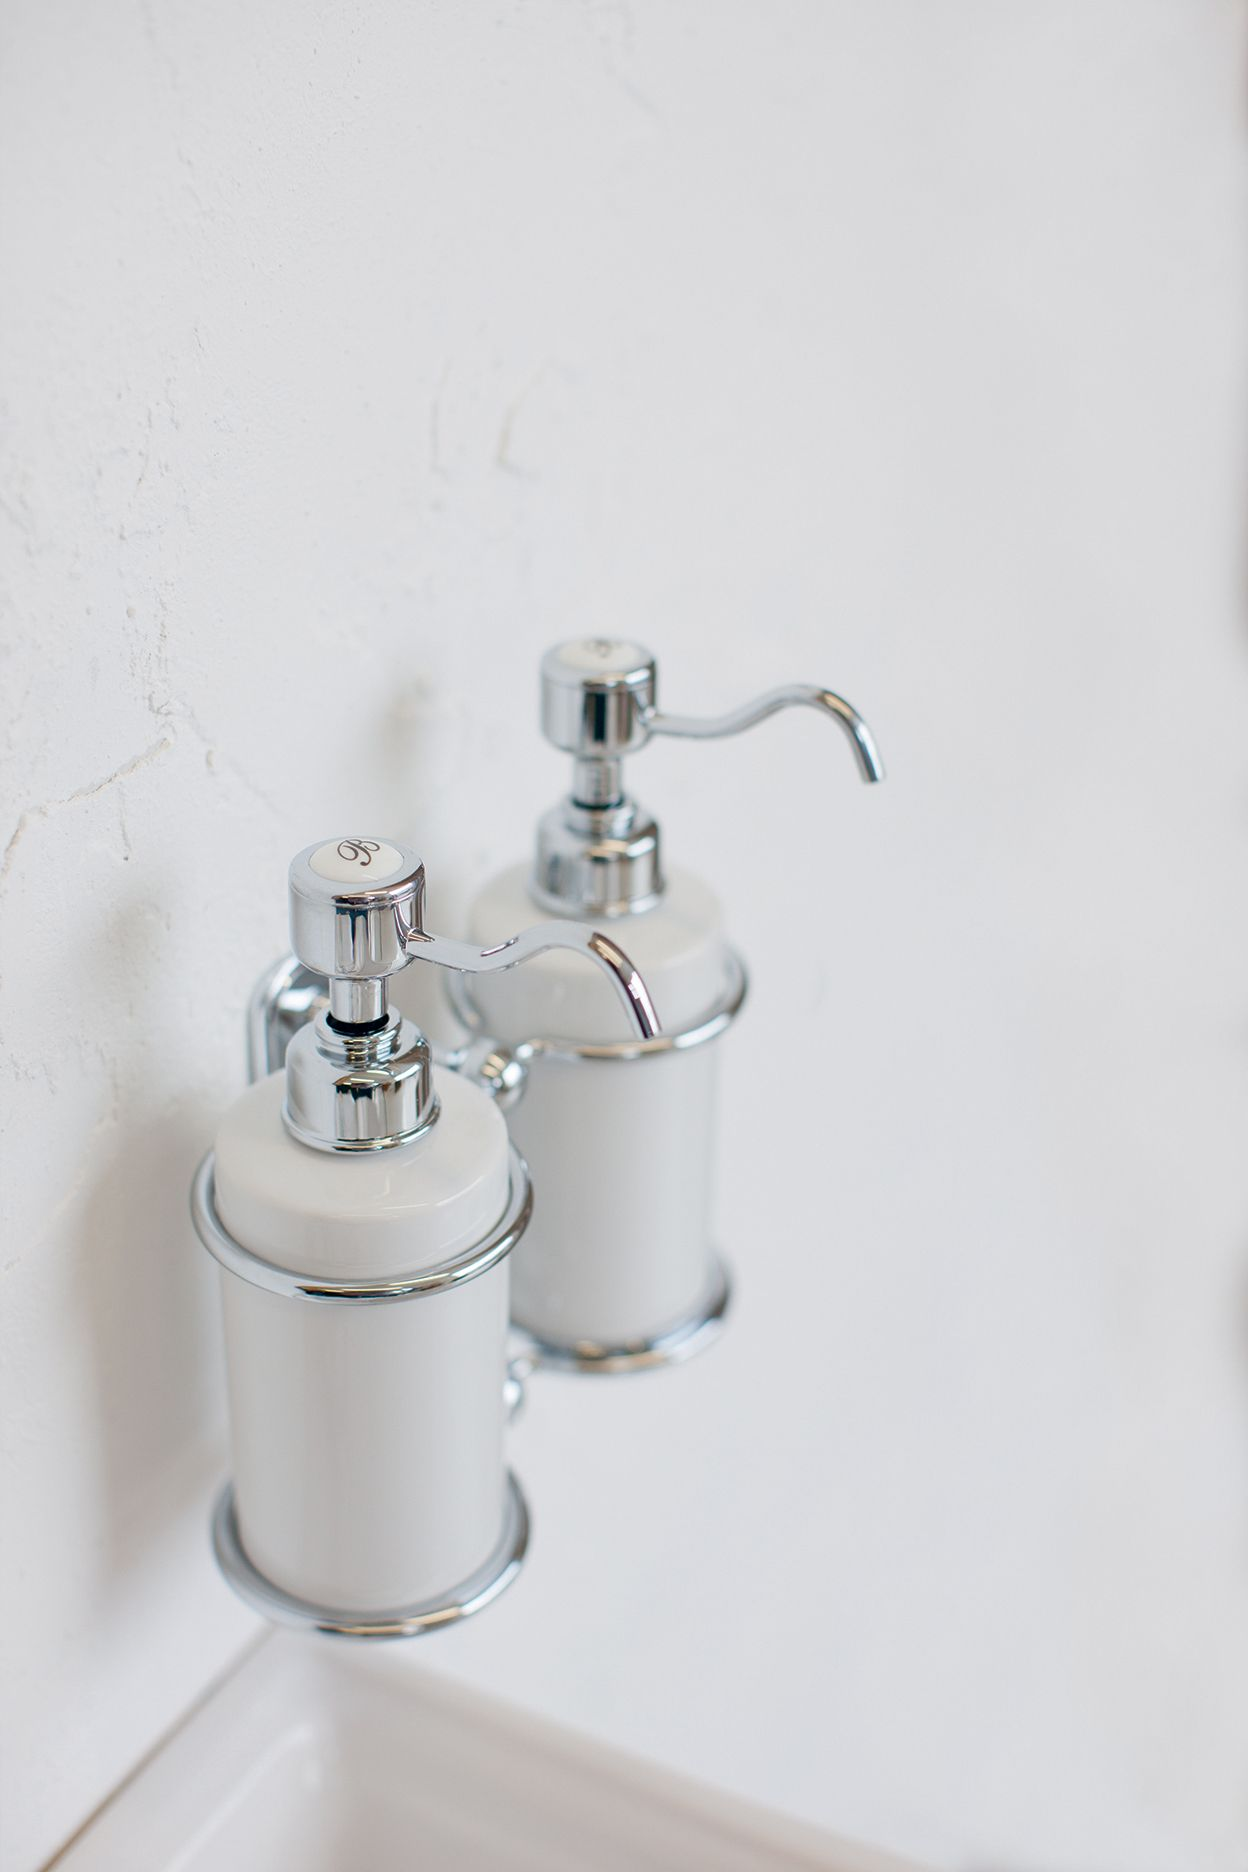 Double Soap Dispenser Badkamer Accessoires Badkamer Accessoires